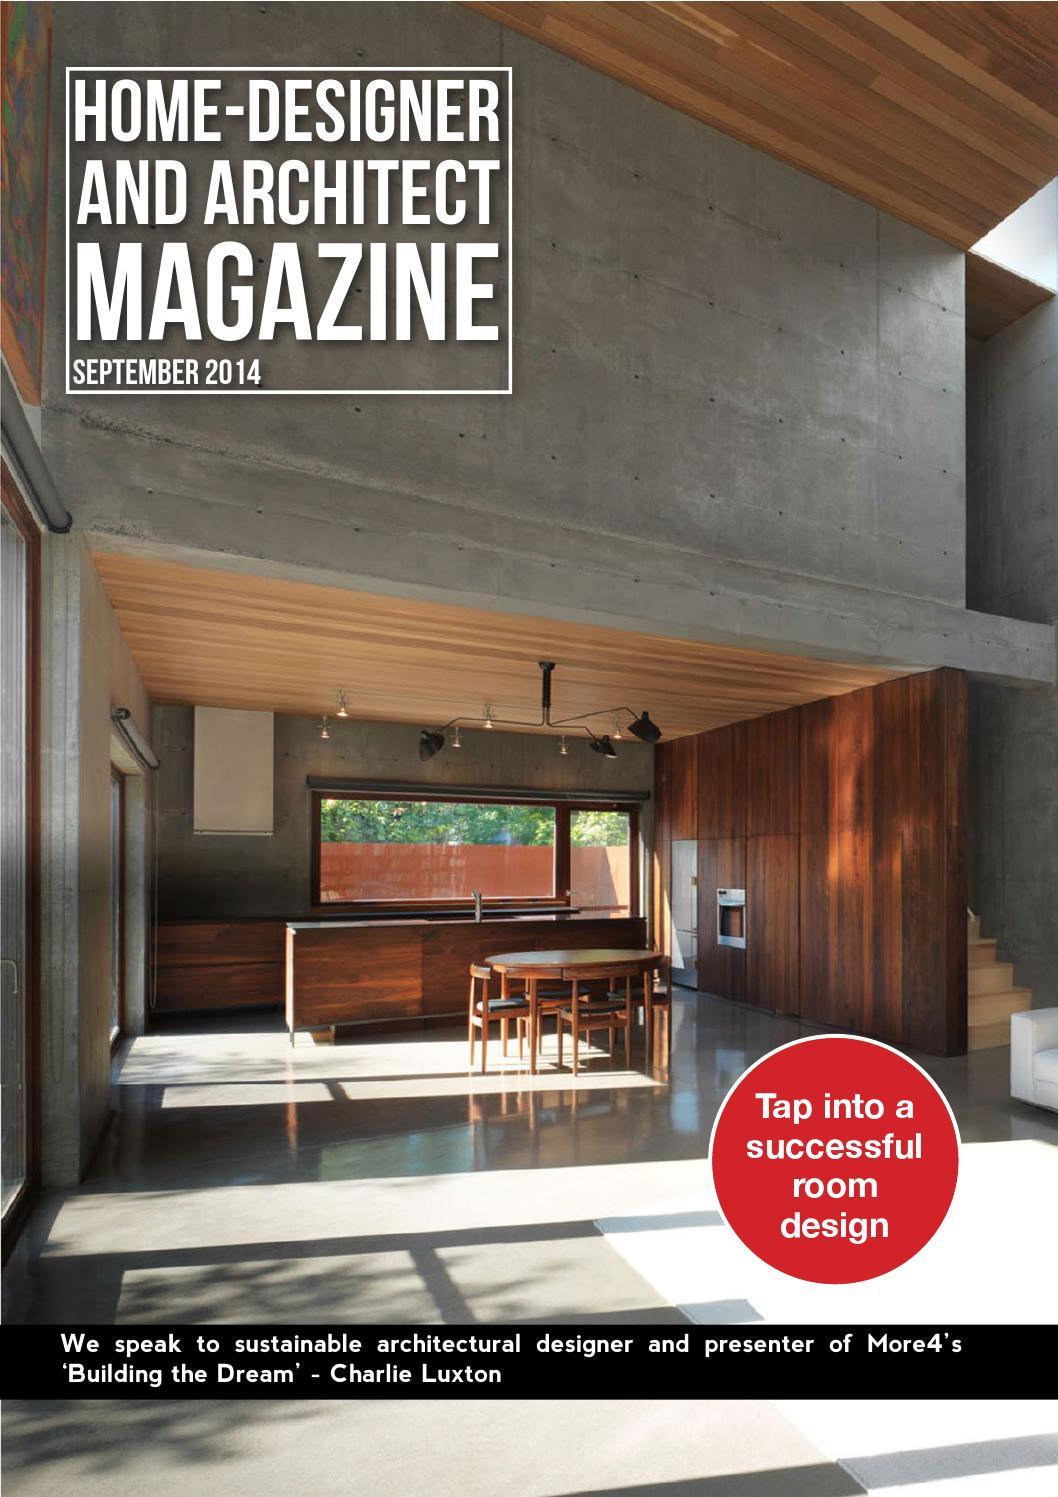 Home Designer and Architect - September 2014 by Jet Digital Media ...